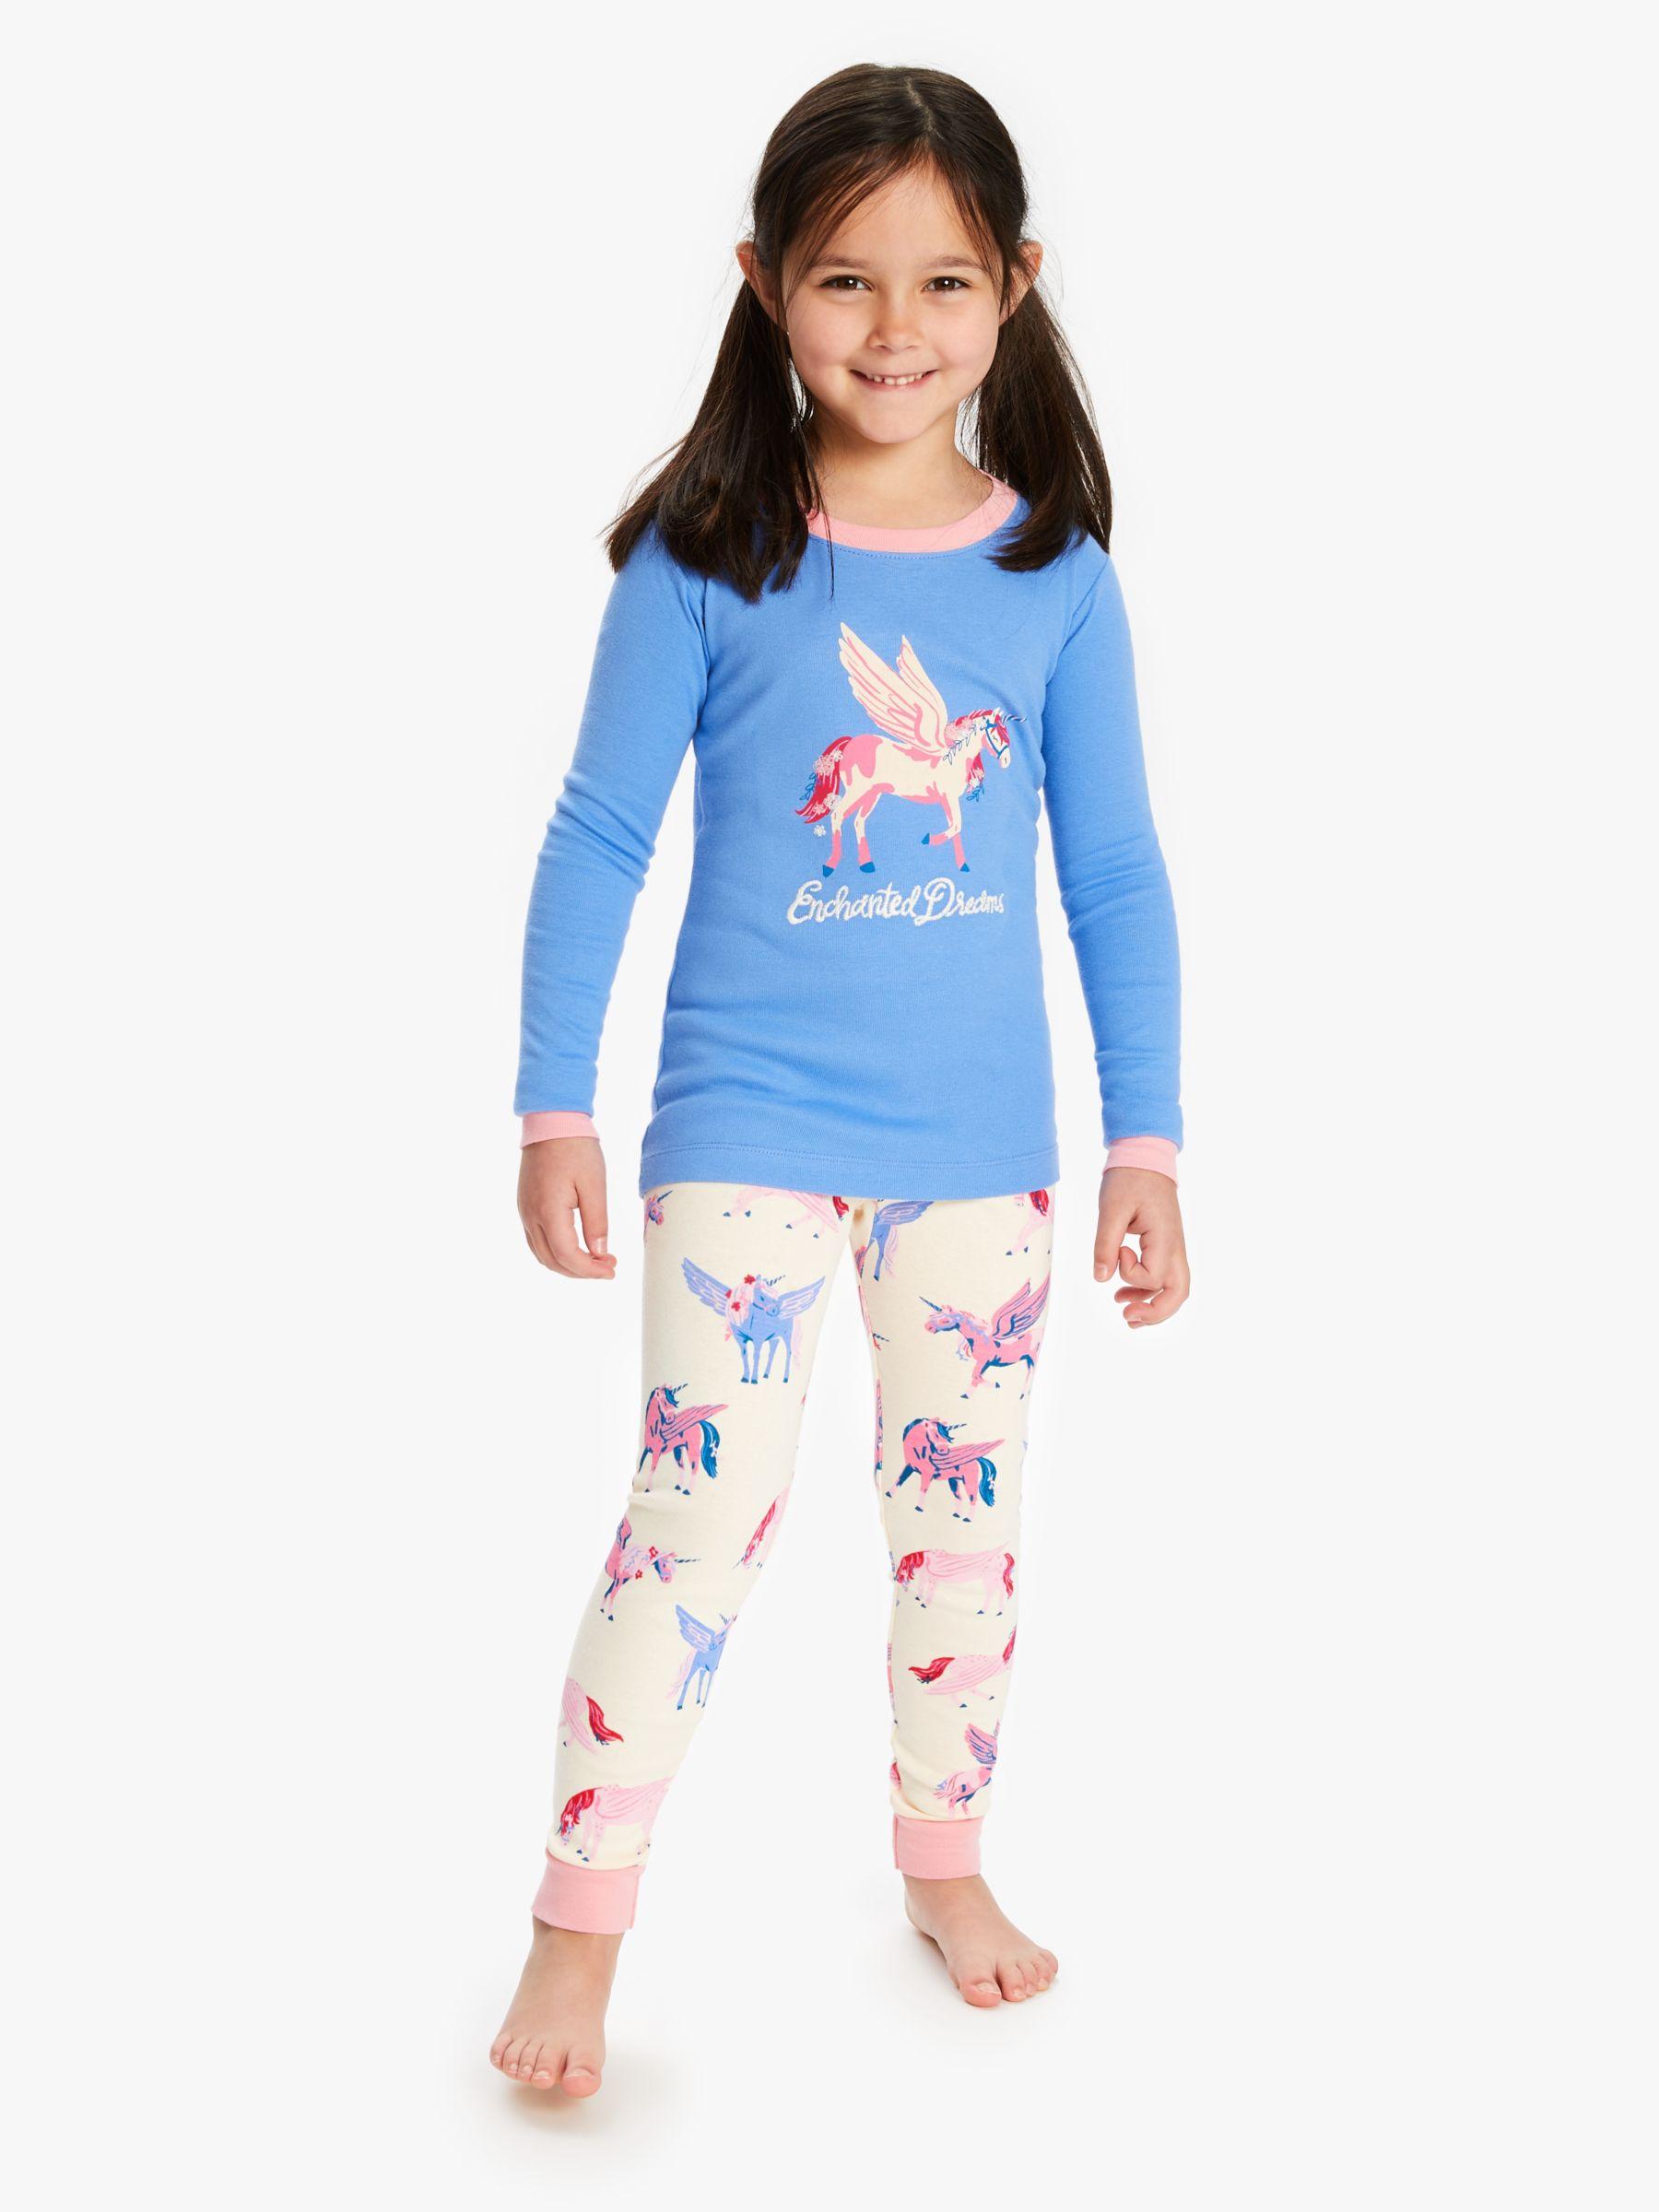 Hatley Hatley Girls' Mystical Unicorns Print Pyjamas, Blue/Multi